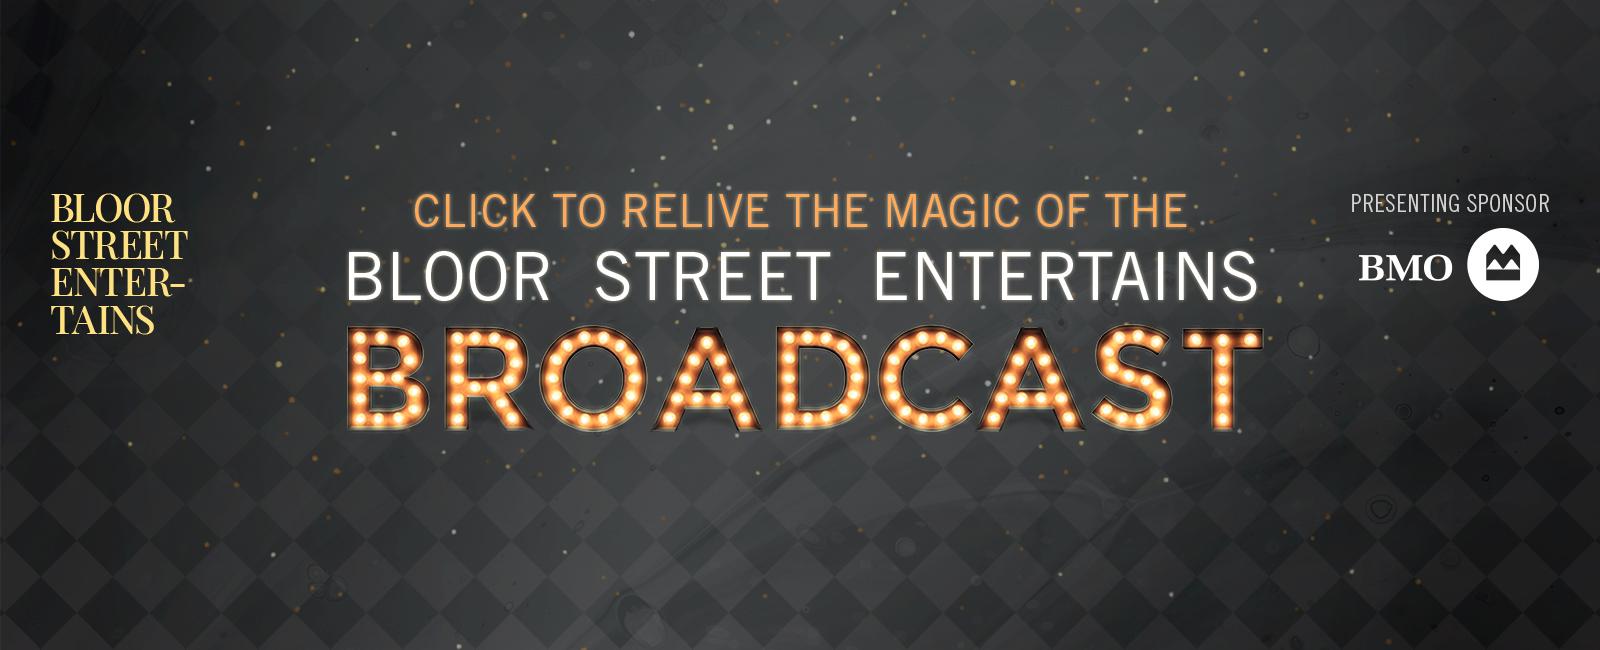 BSE 2020 Broadcast ReWatch